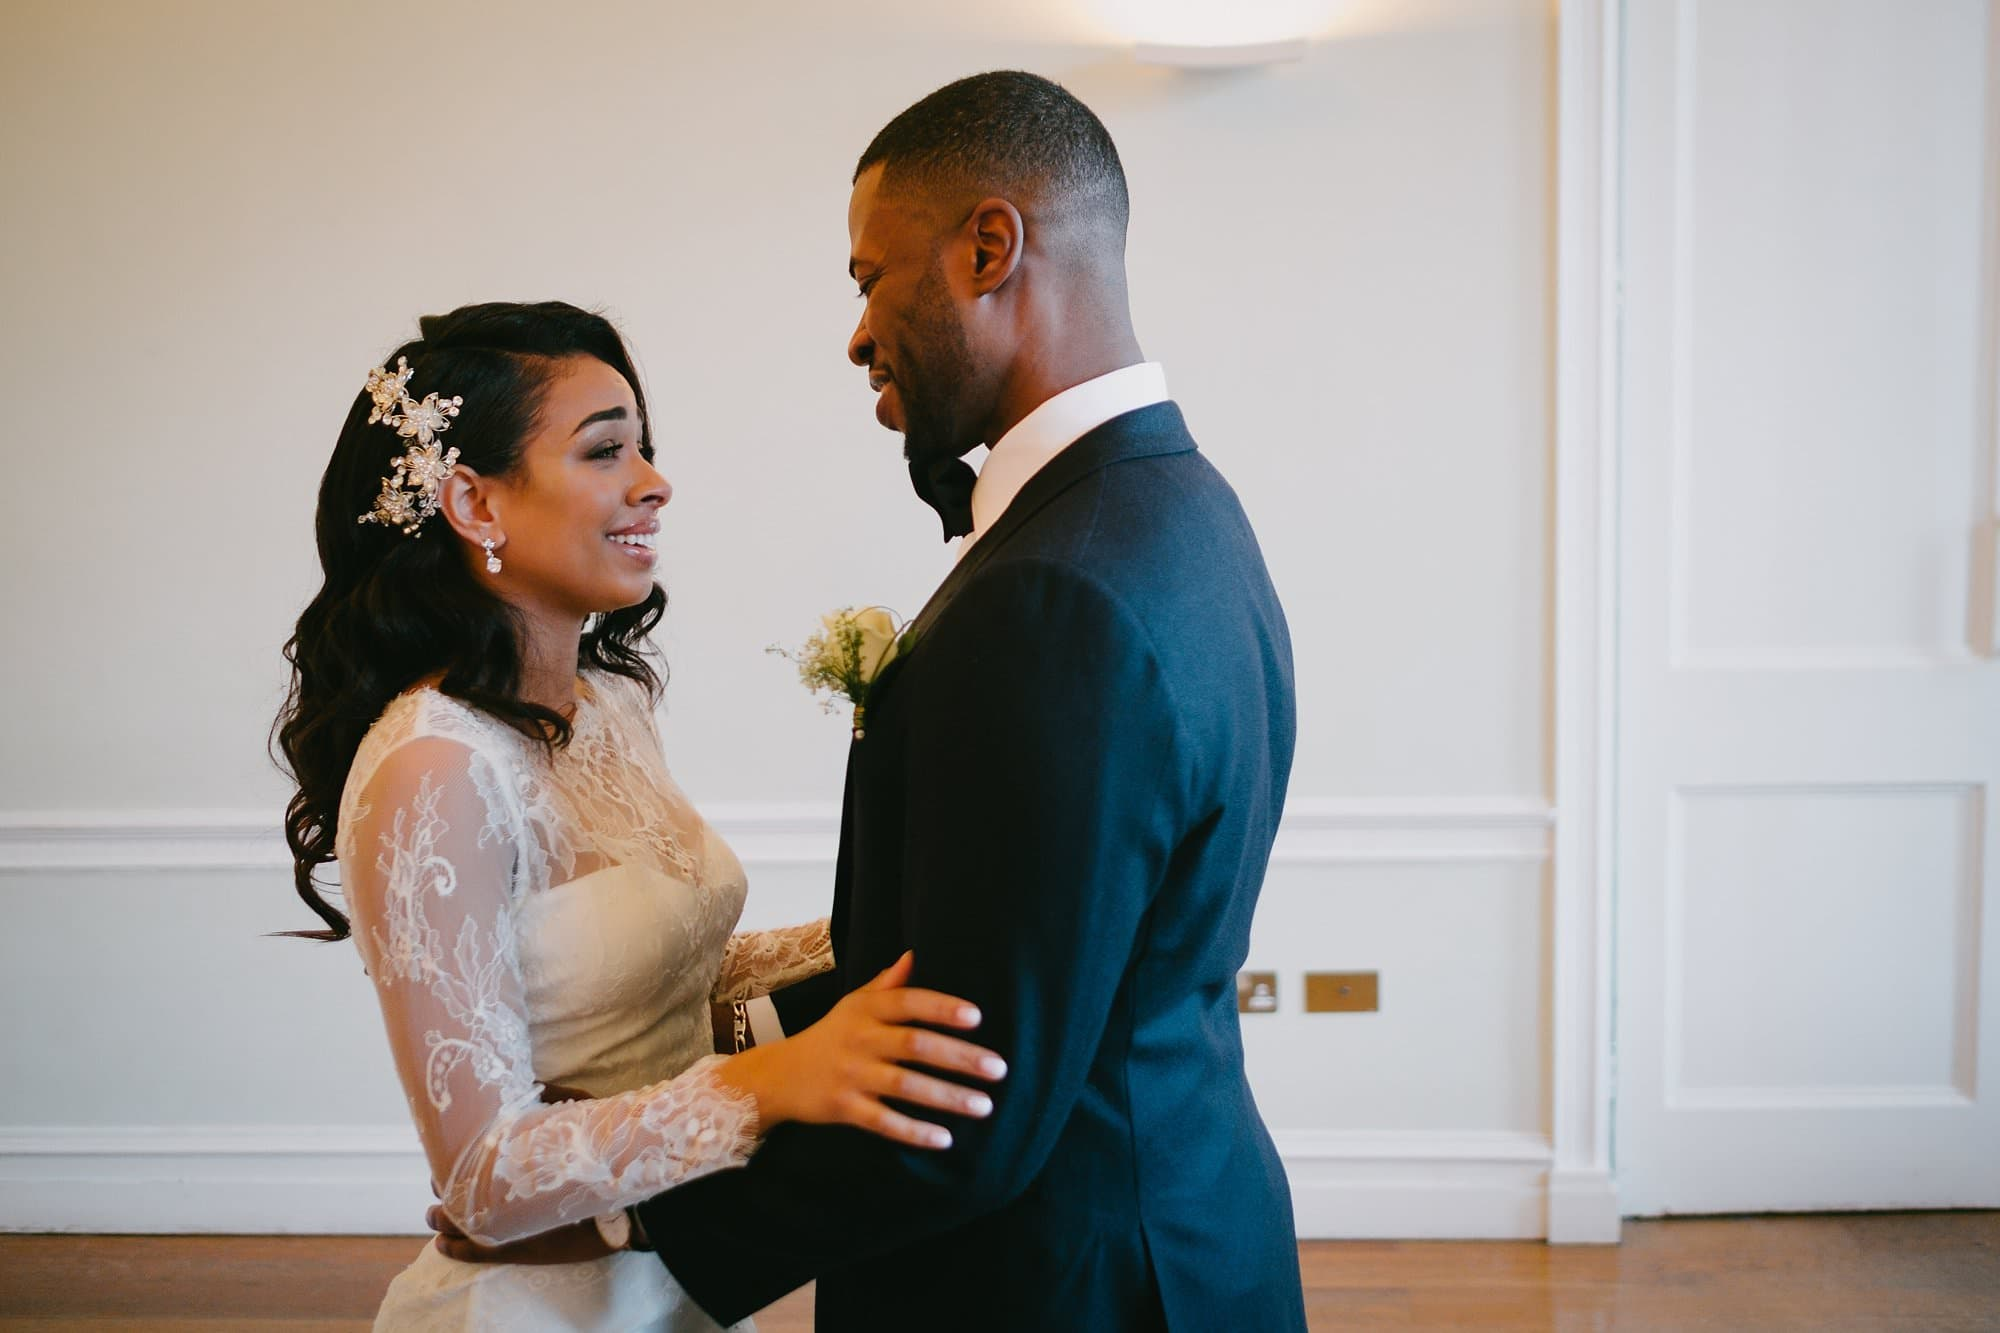 asia house london wedding photographer 007 - Rachel + Gabriel   Asia House Wedding Photography